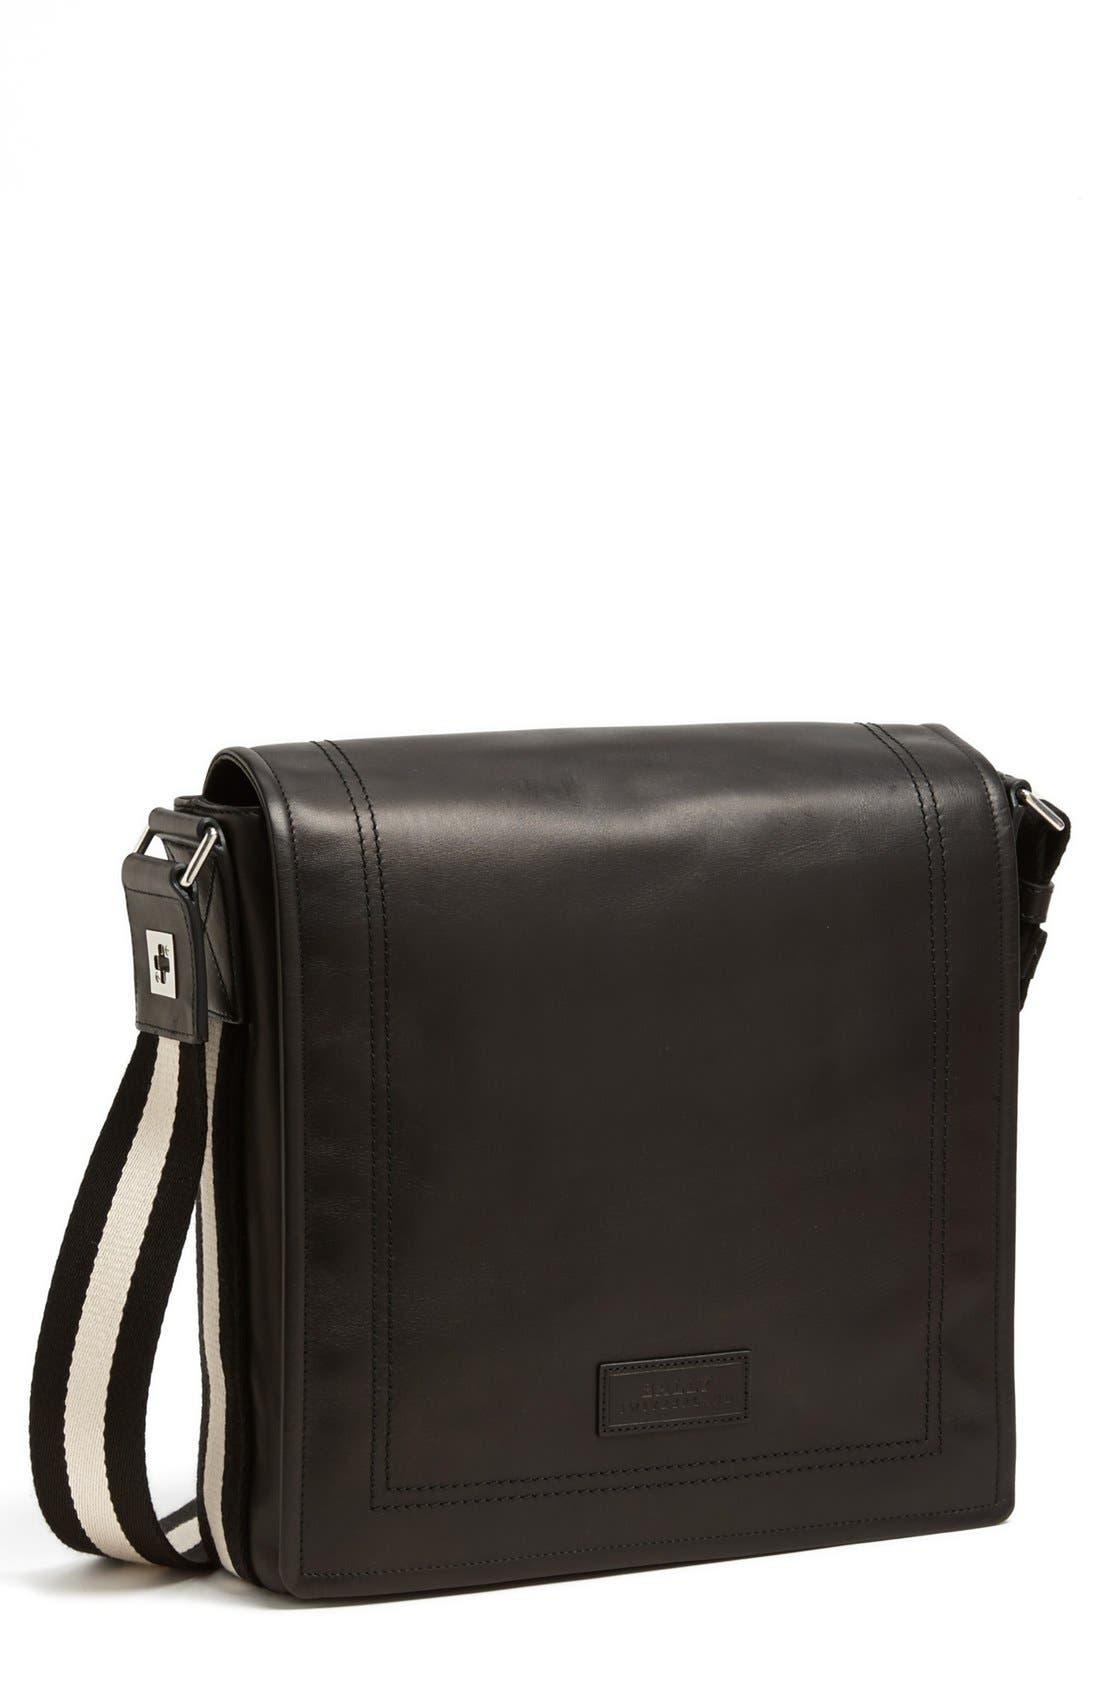 Alternate Image 1 Selected - Bally 'Small Triar Plain' Calfskin Messenger Bag